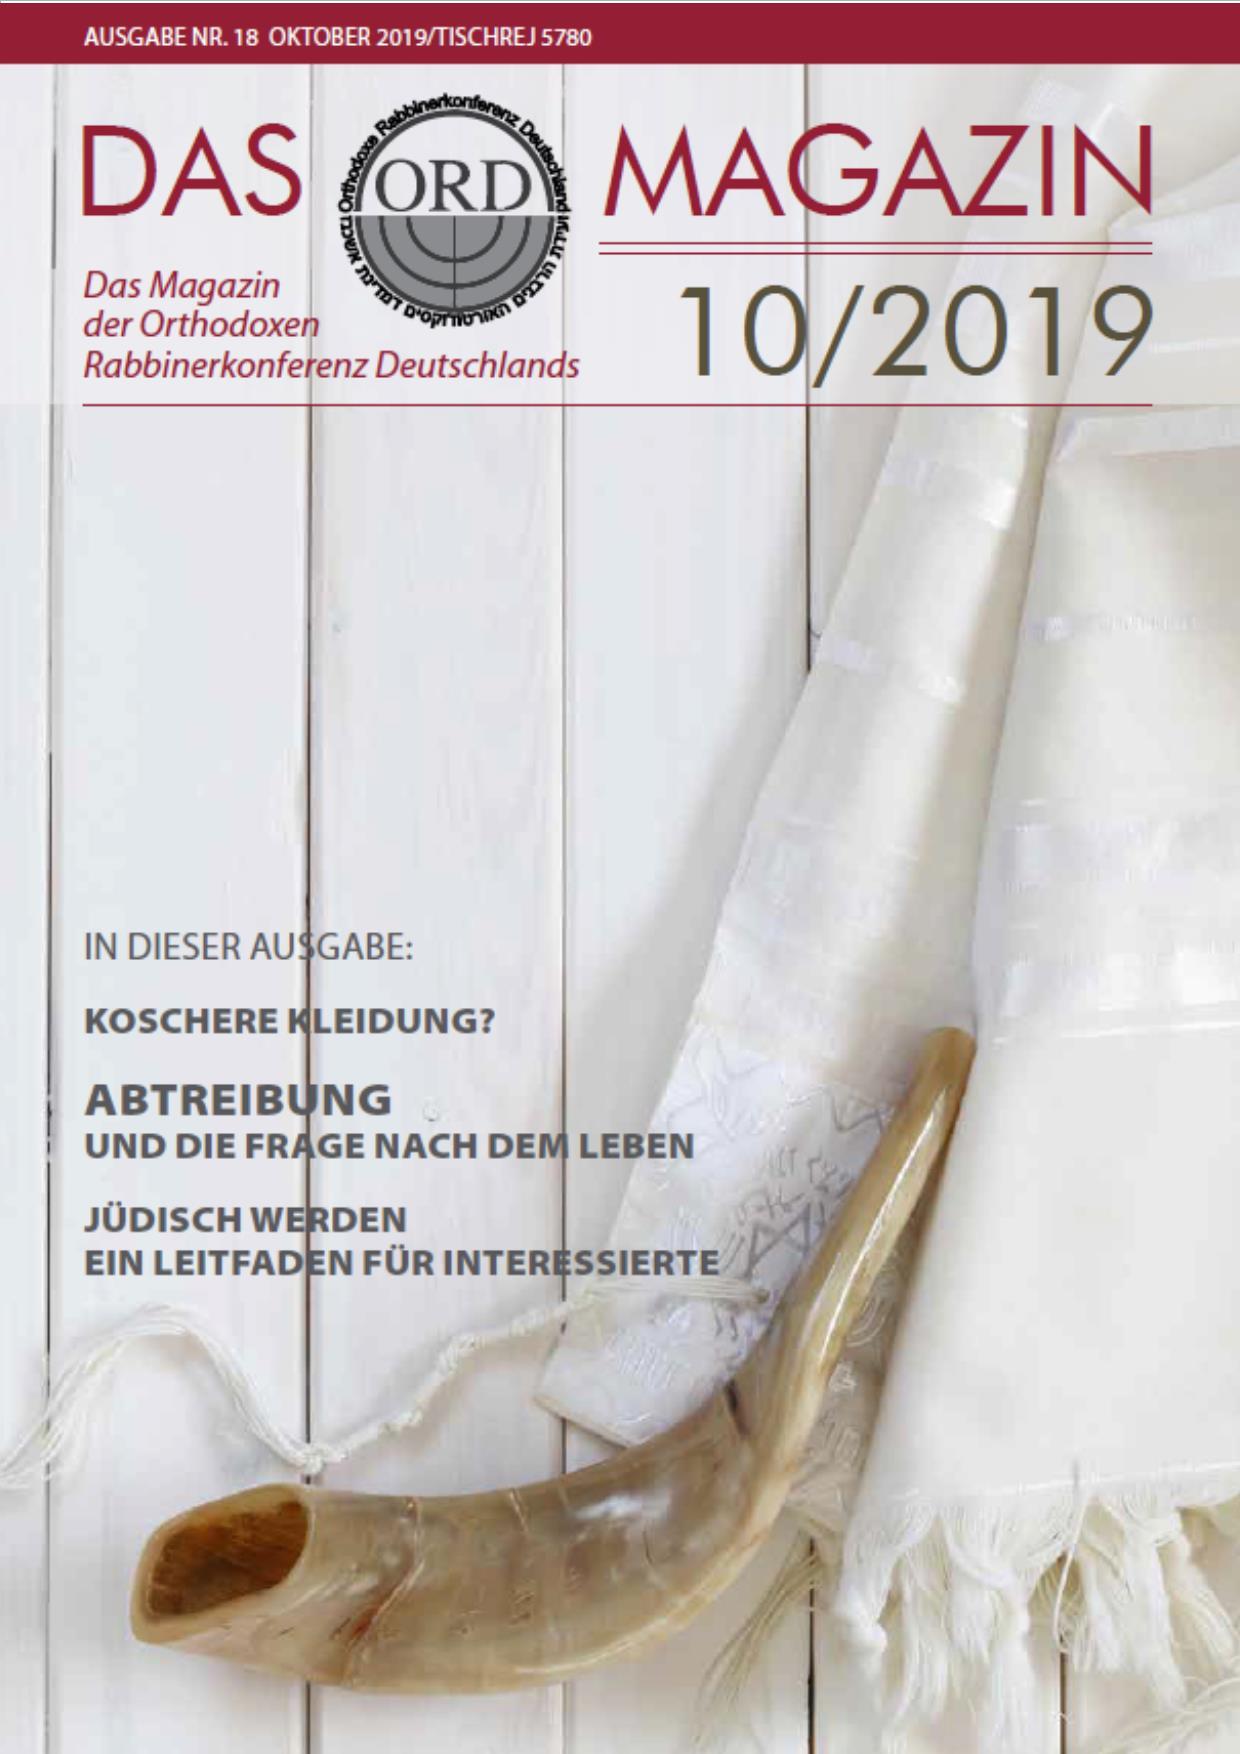 ORD Magazin 10/2019